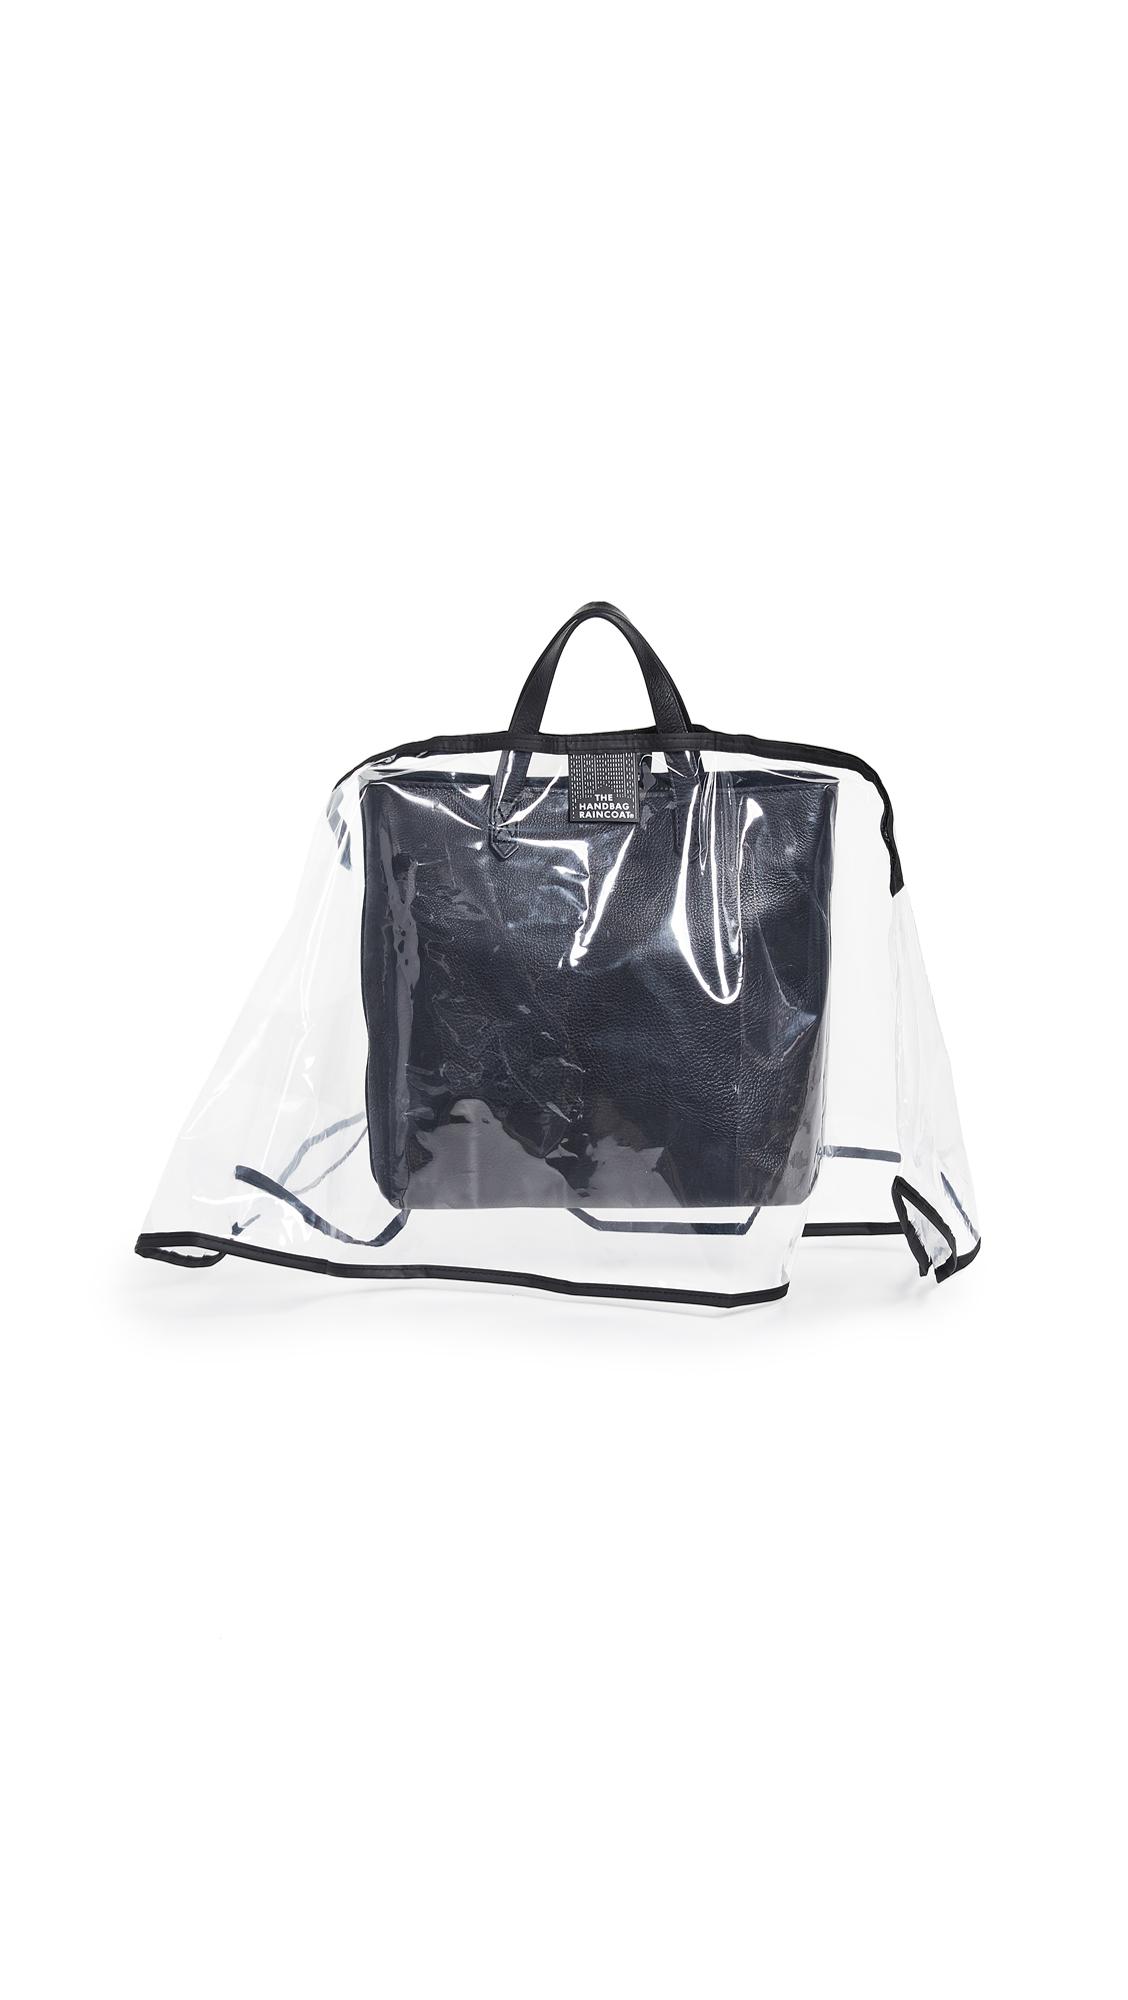 The Handbag Raincoat Medium City Slicker Handbag Raincoat - Clear/Black